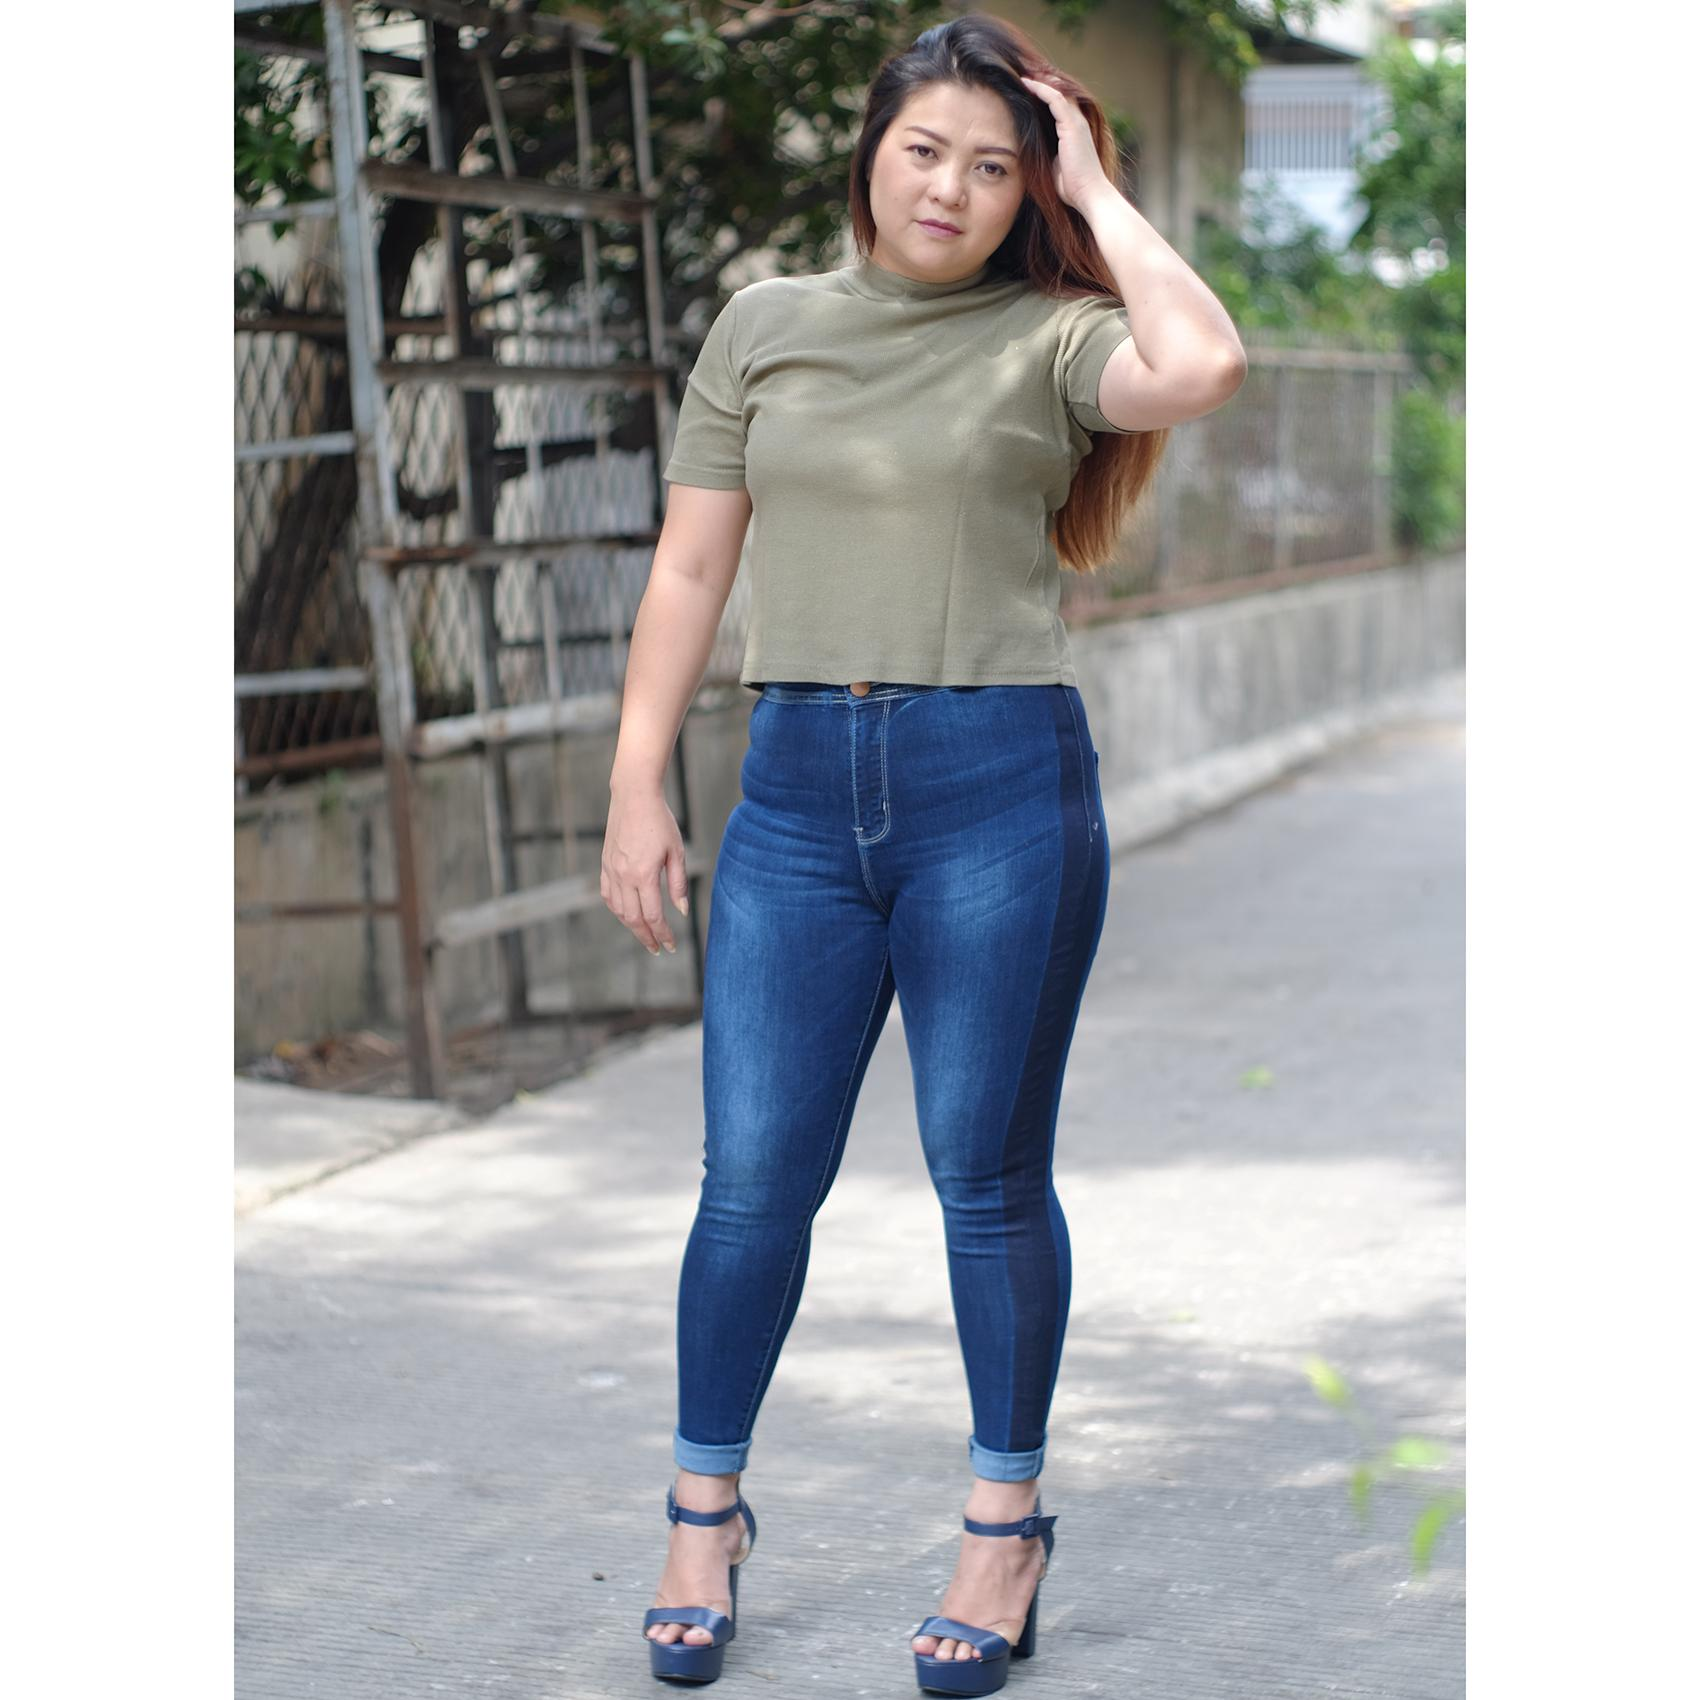 Rumah Jeans / Celana Jeans Jumbo Wanita / Highwaist Jumbo 8481 / Jeans Highwaist Cewek